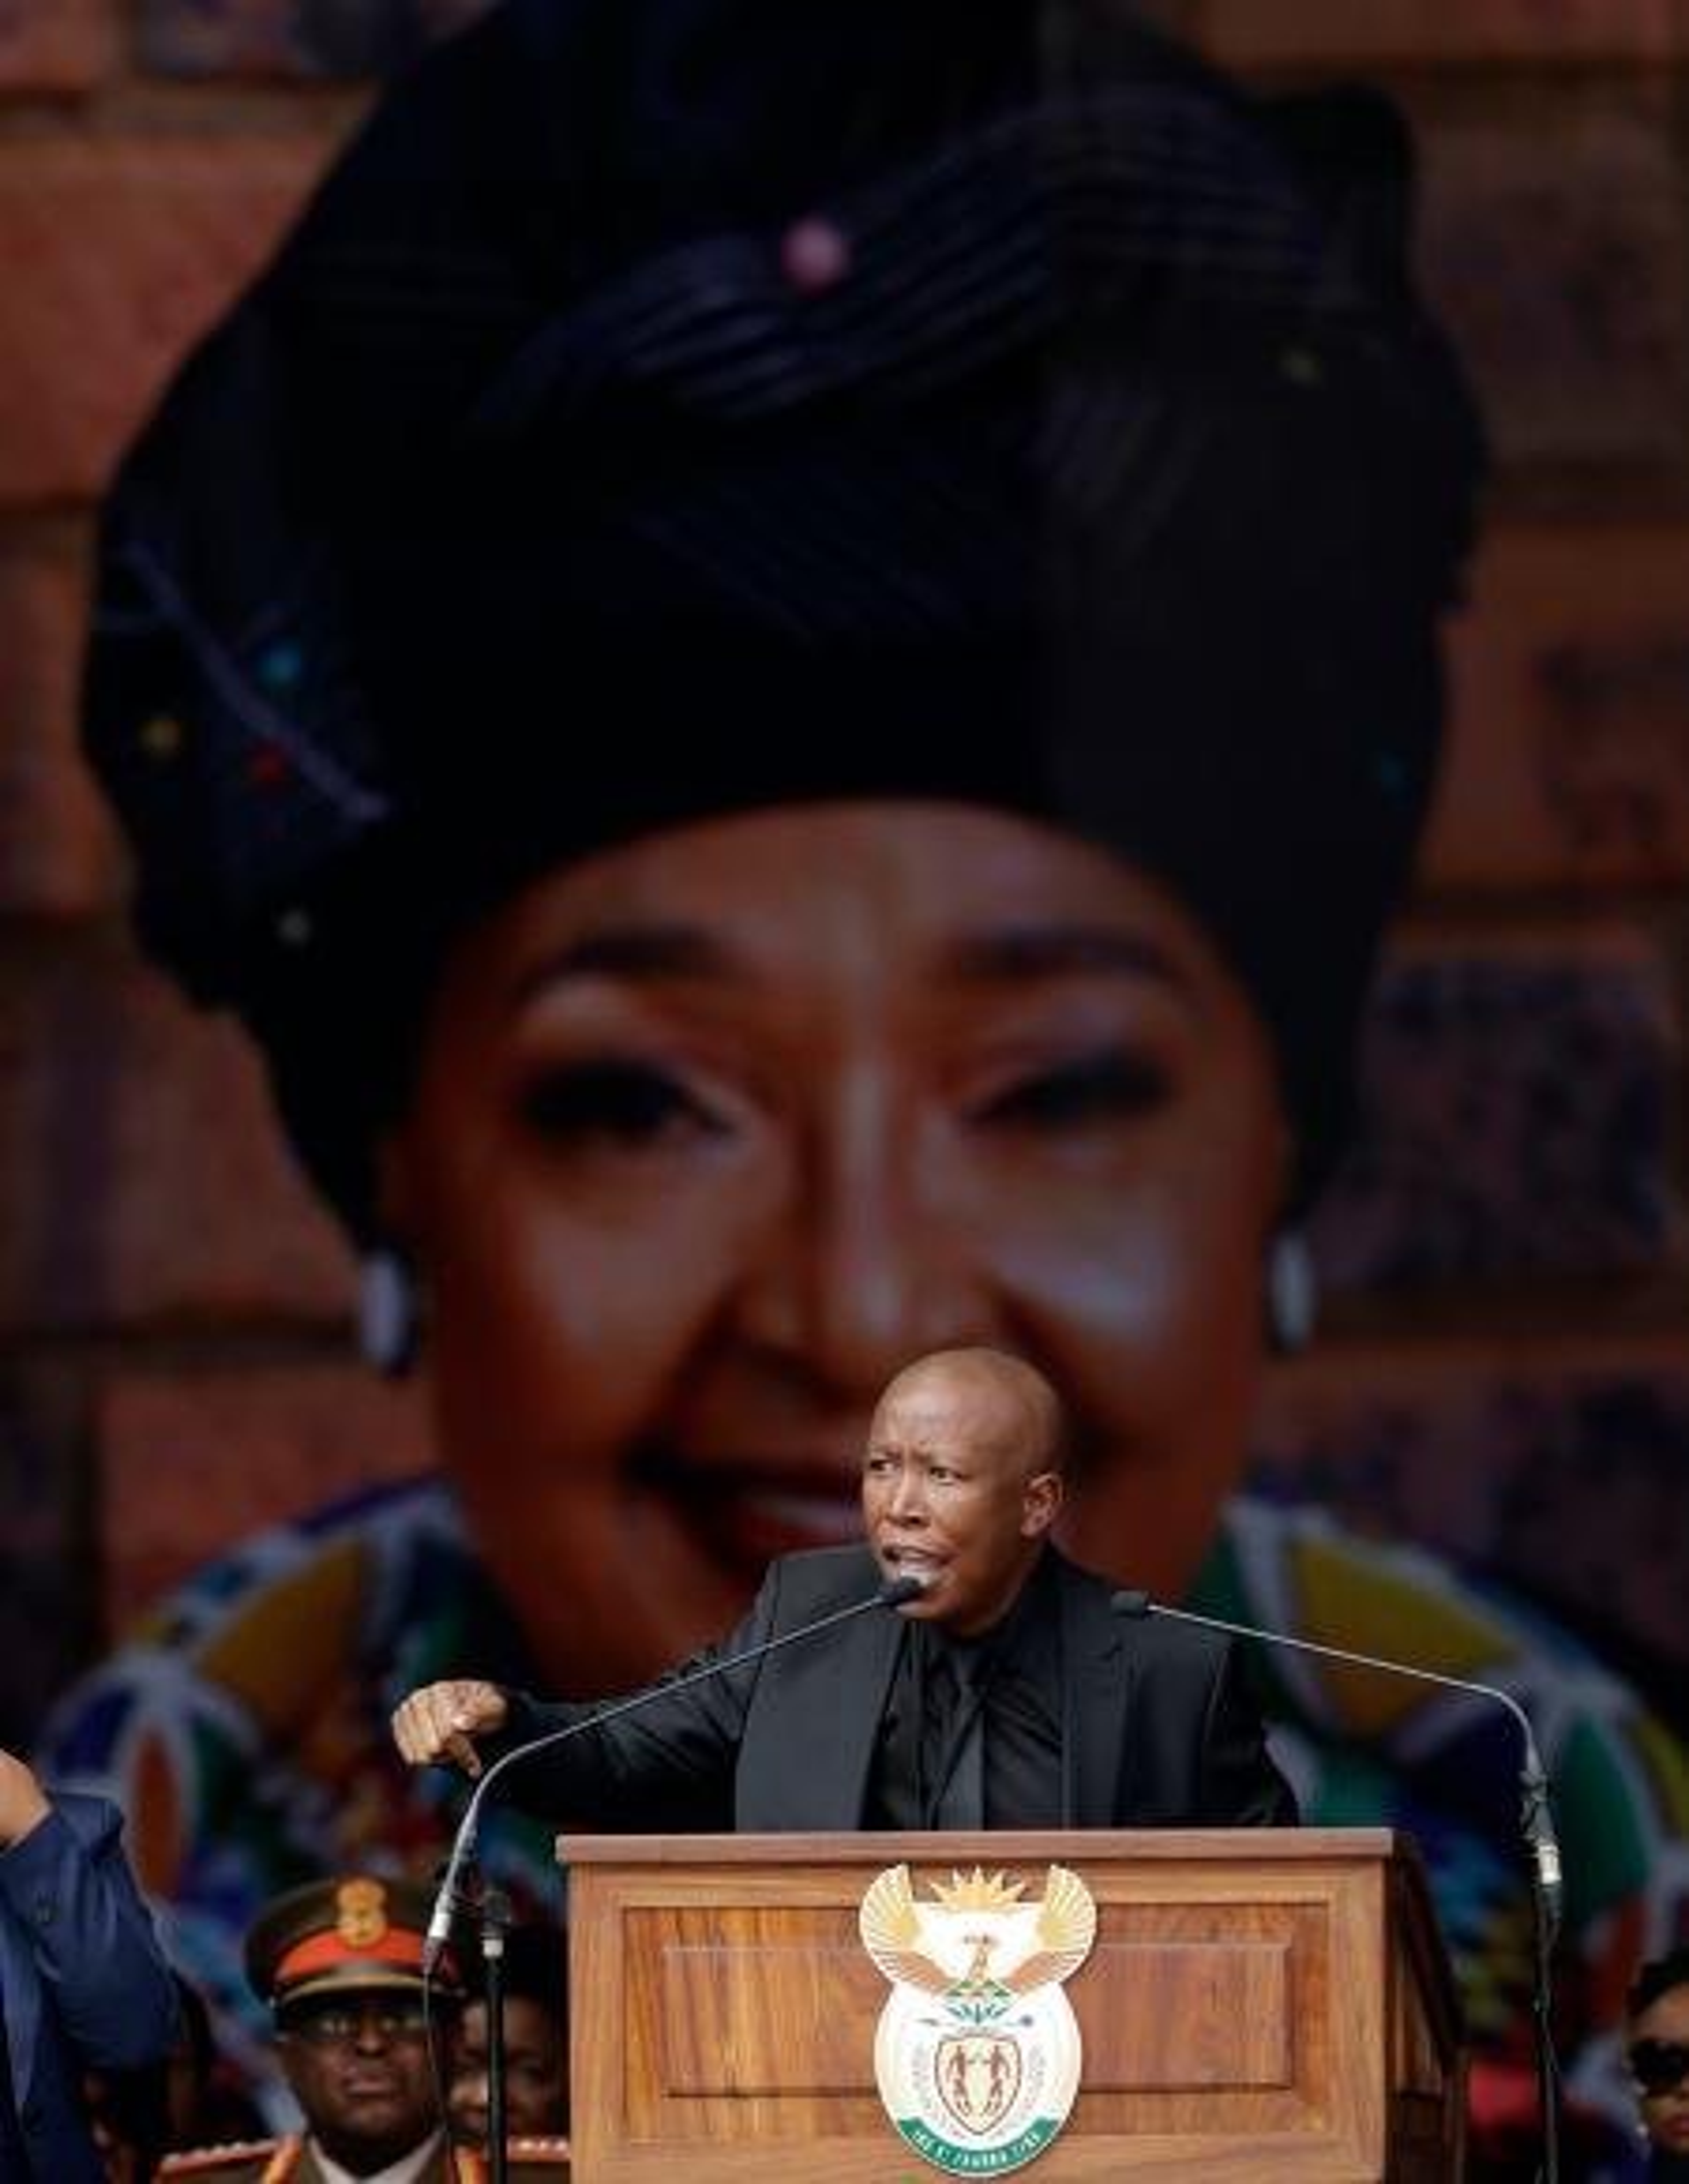 Winnie Mandela Funeral: Anti-apartheid icon's death reveals apartheid campaign of misinformation